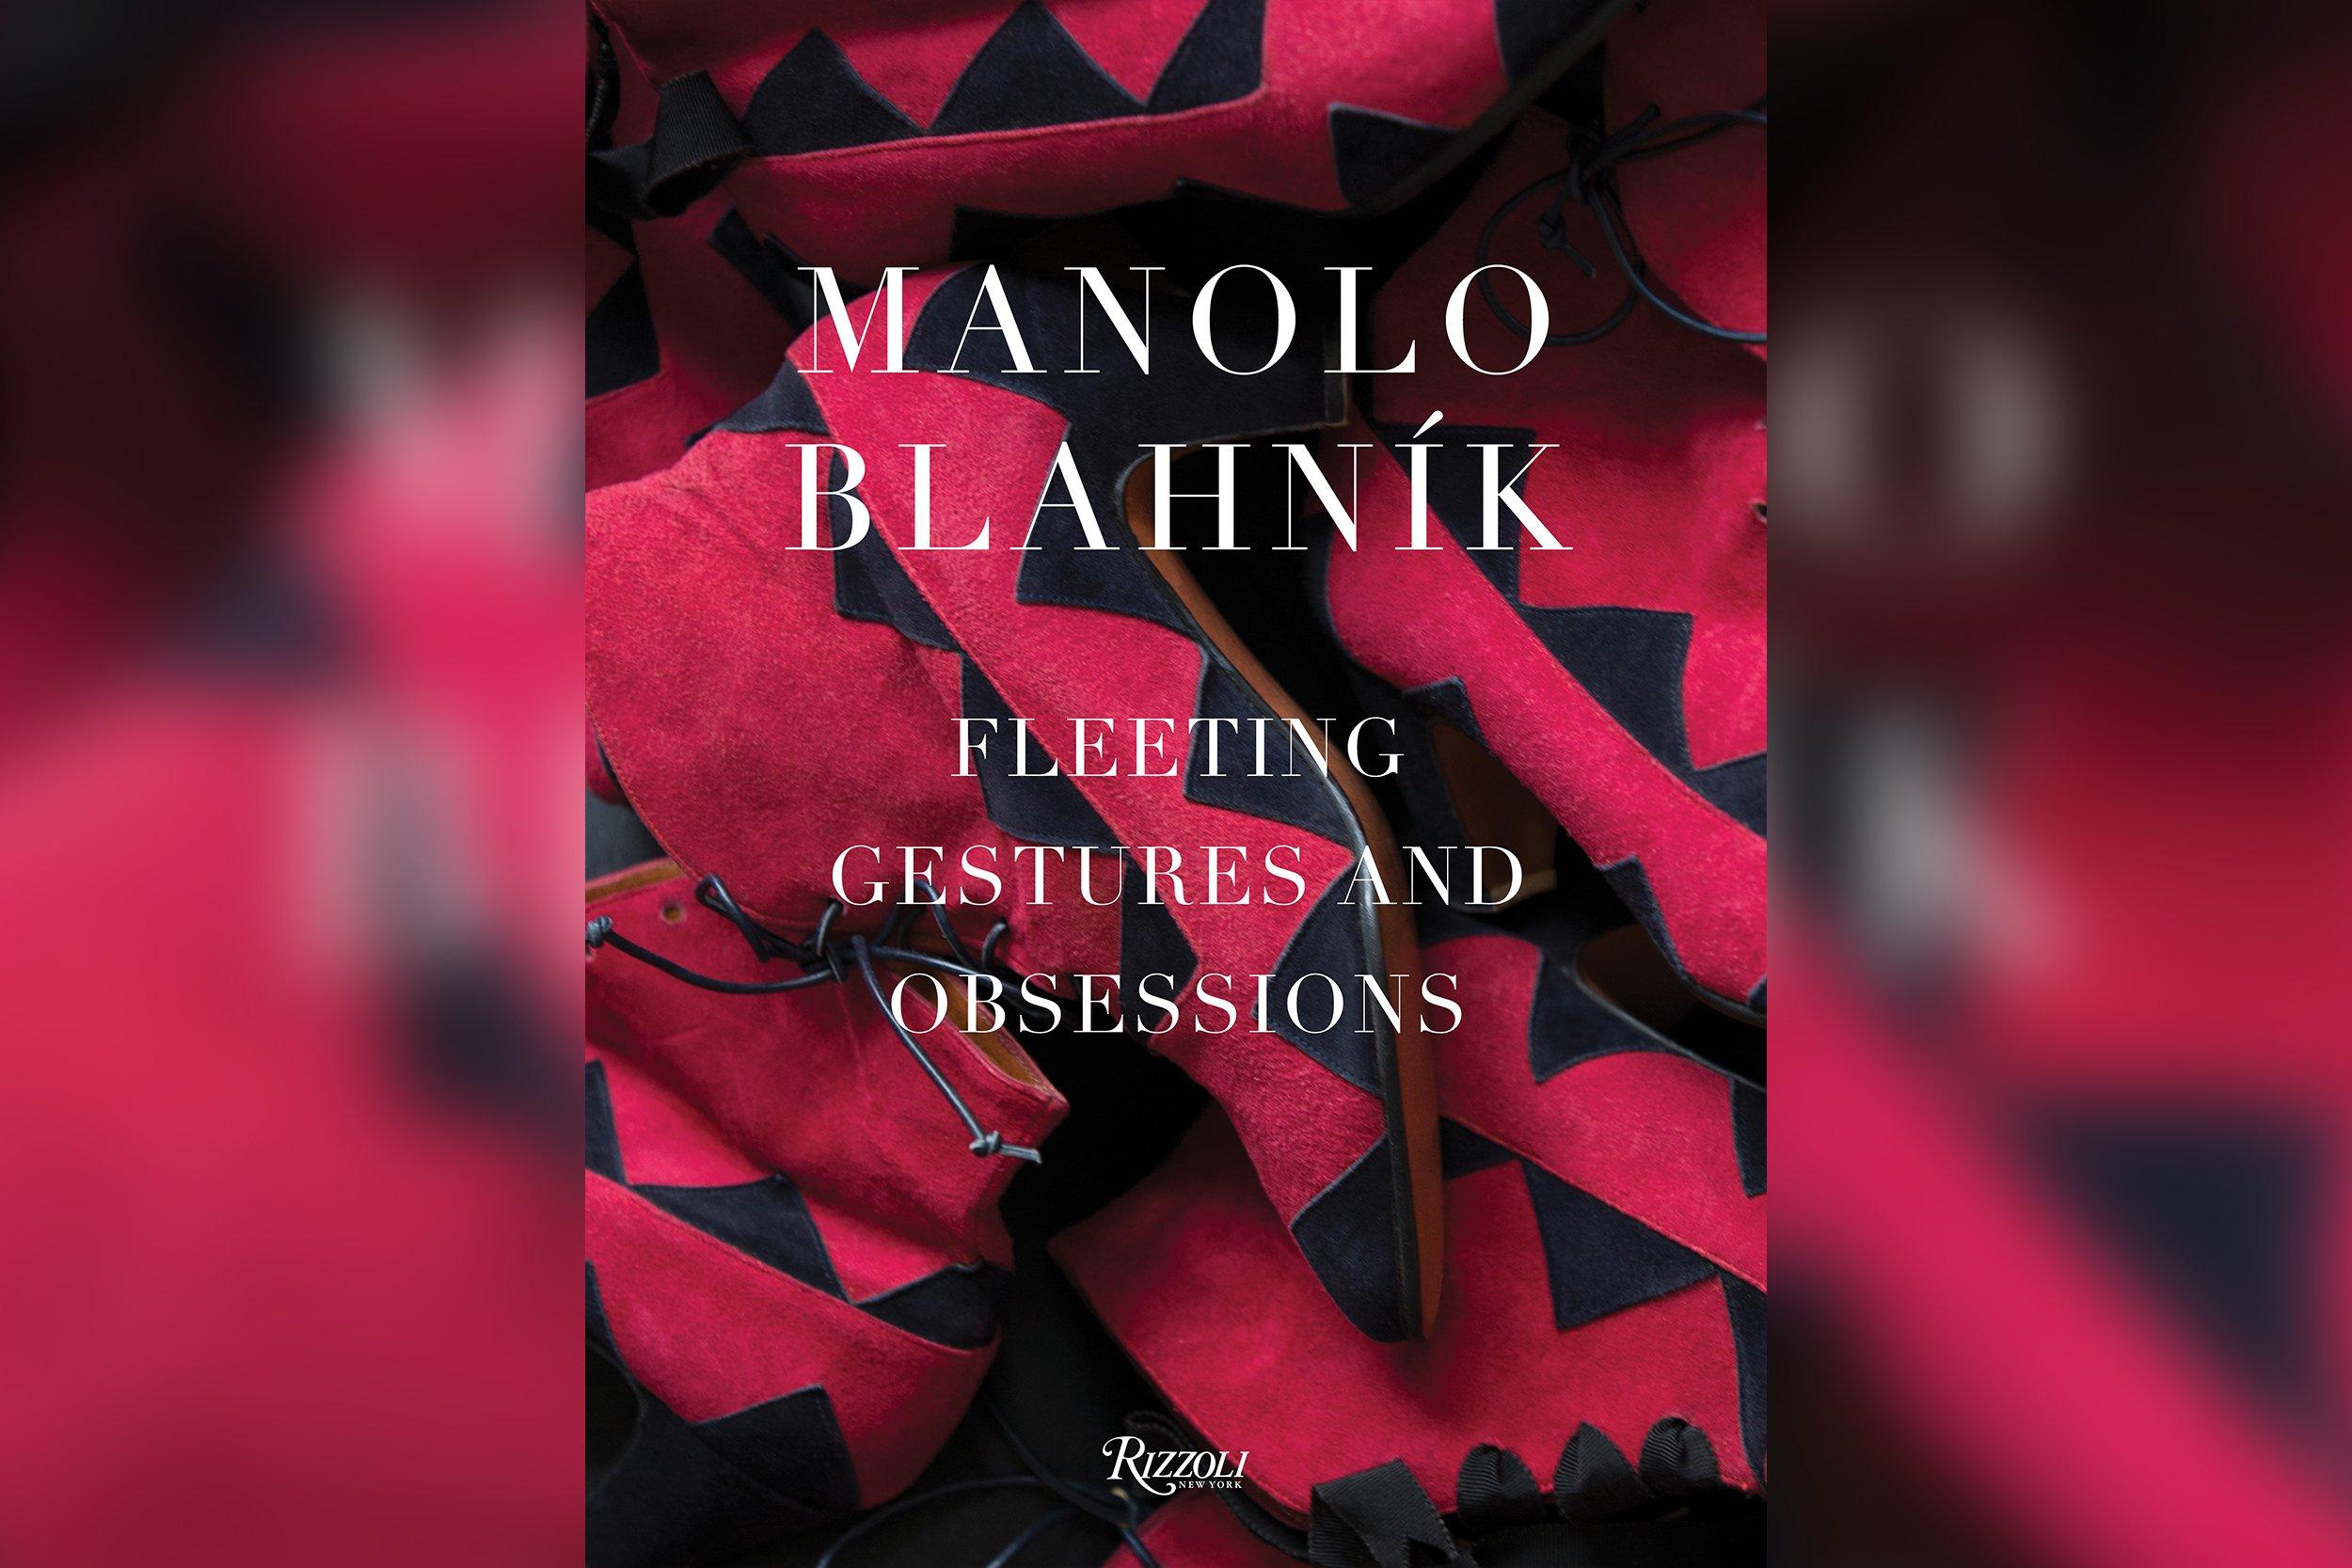 ManoloBlahnik_cover (1)